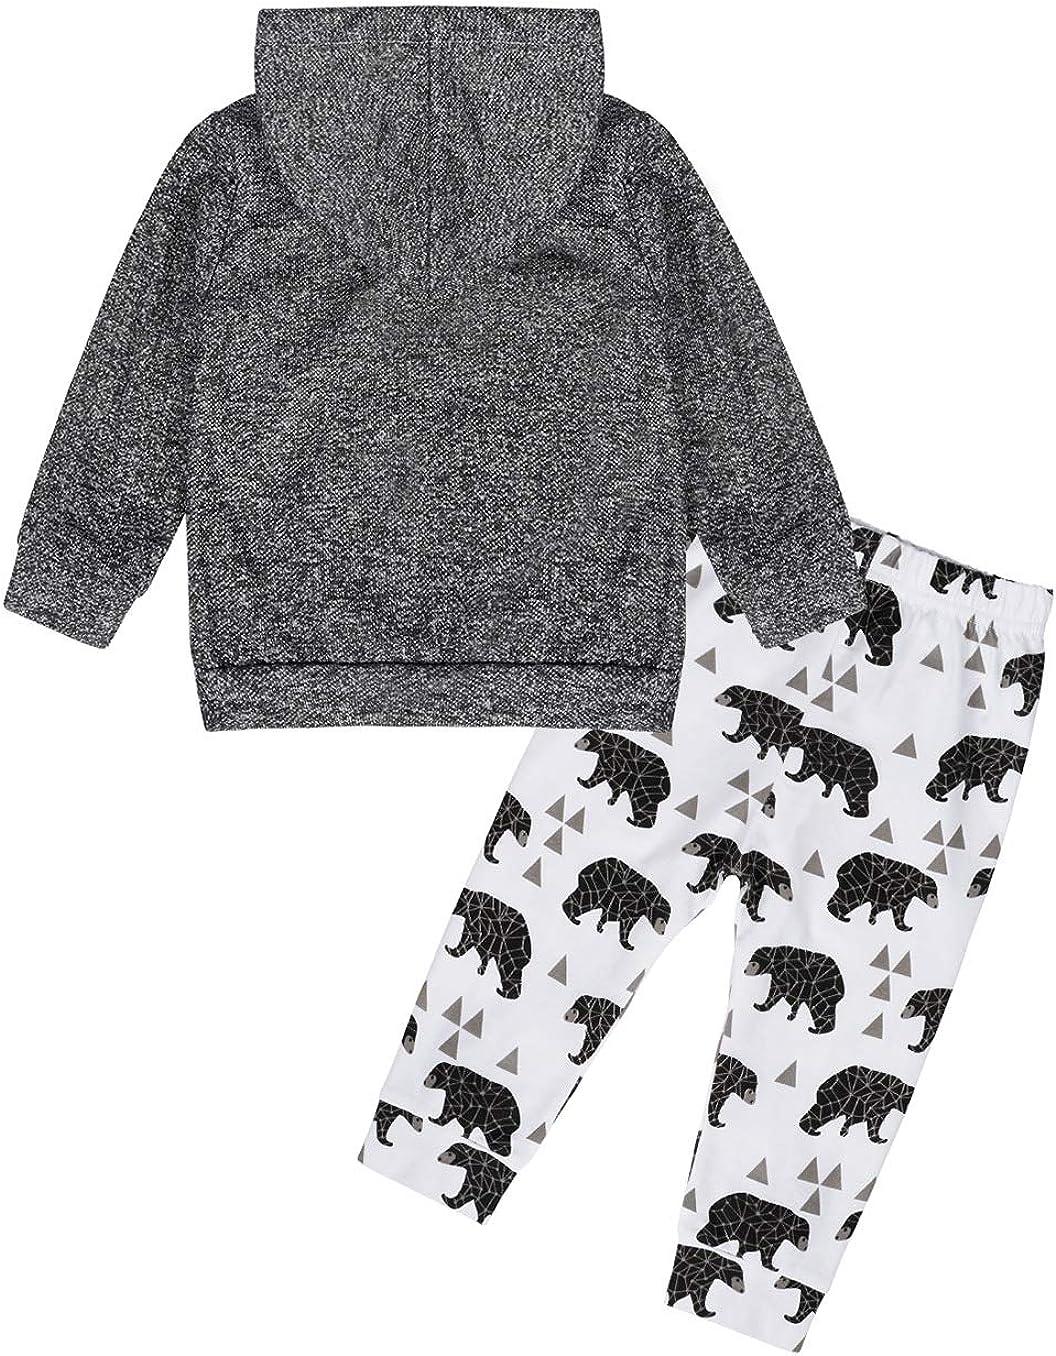 Jurebecia Toddler Newborn Baby Boy Clothes Long Sleeve Letter Print Romper+Long Pants+Hat 3PCS Outfits Set